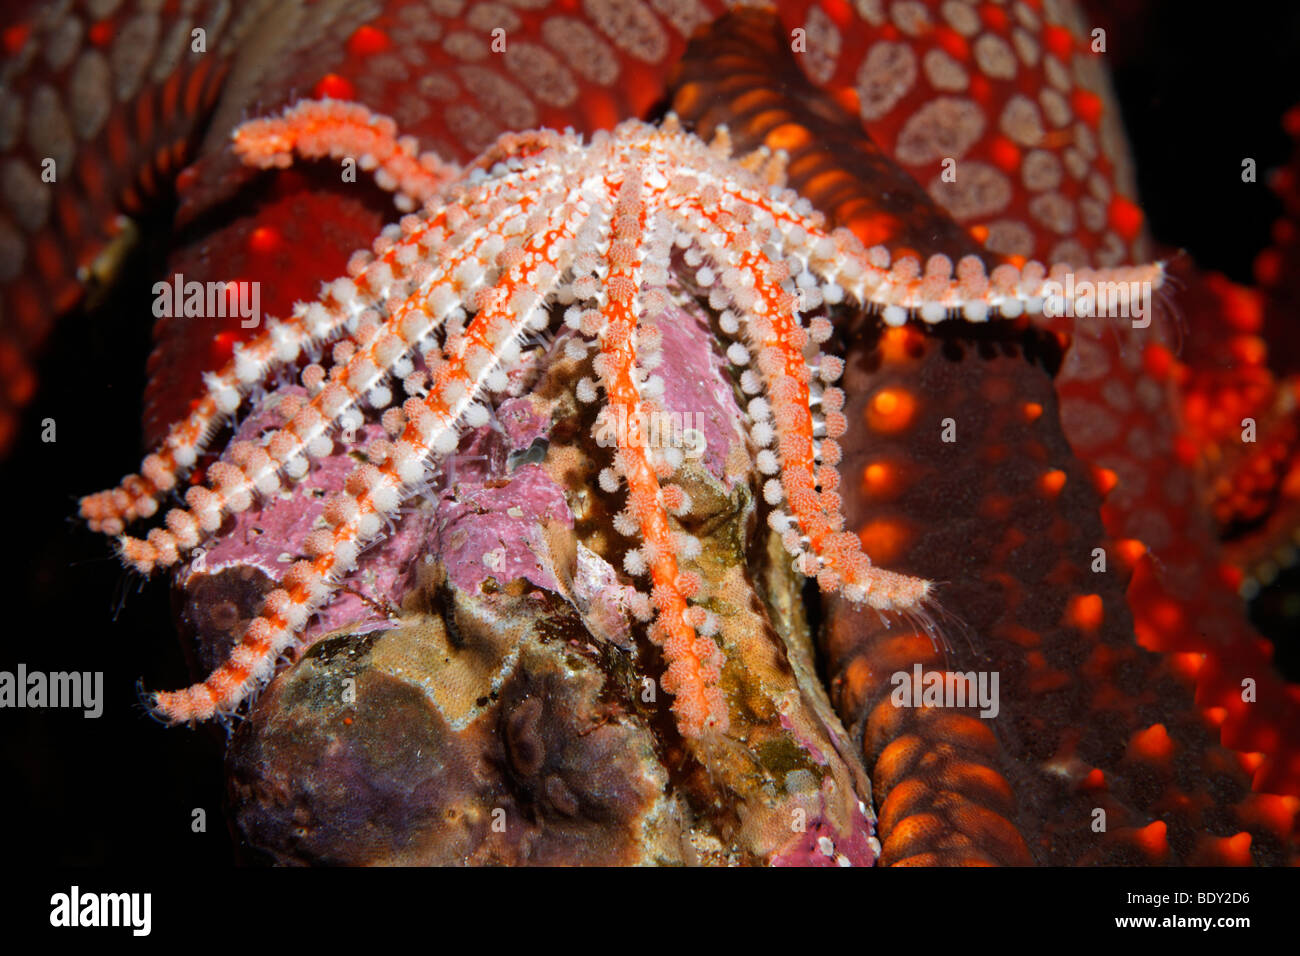 Étoiles de mer (Asteroidae inconnu) en face d'une étoile à crampons (Pentaceraster cumingi), Photo Stock